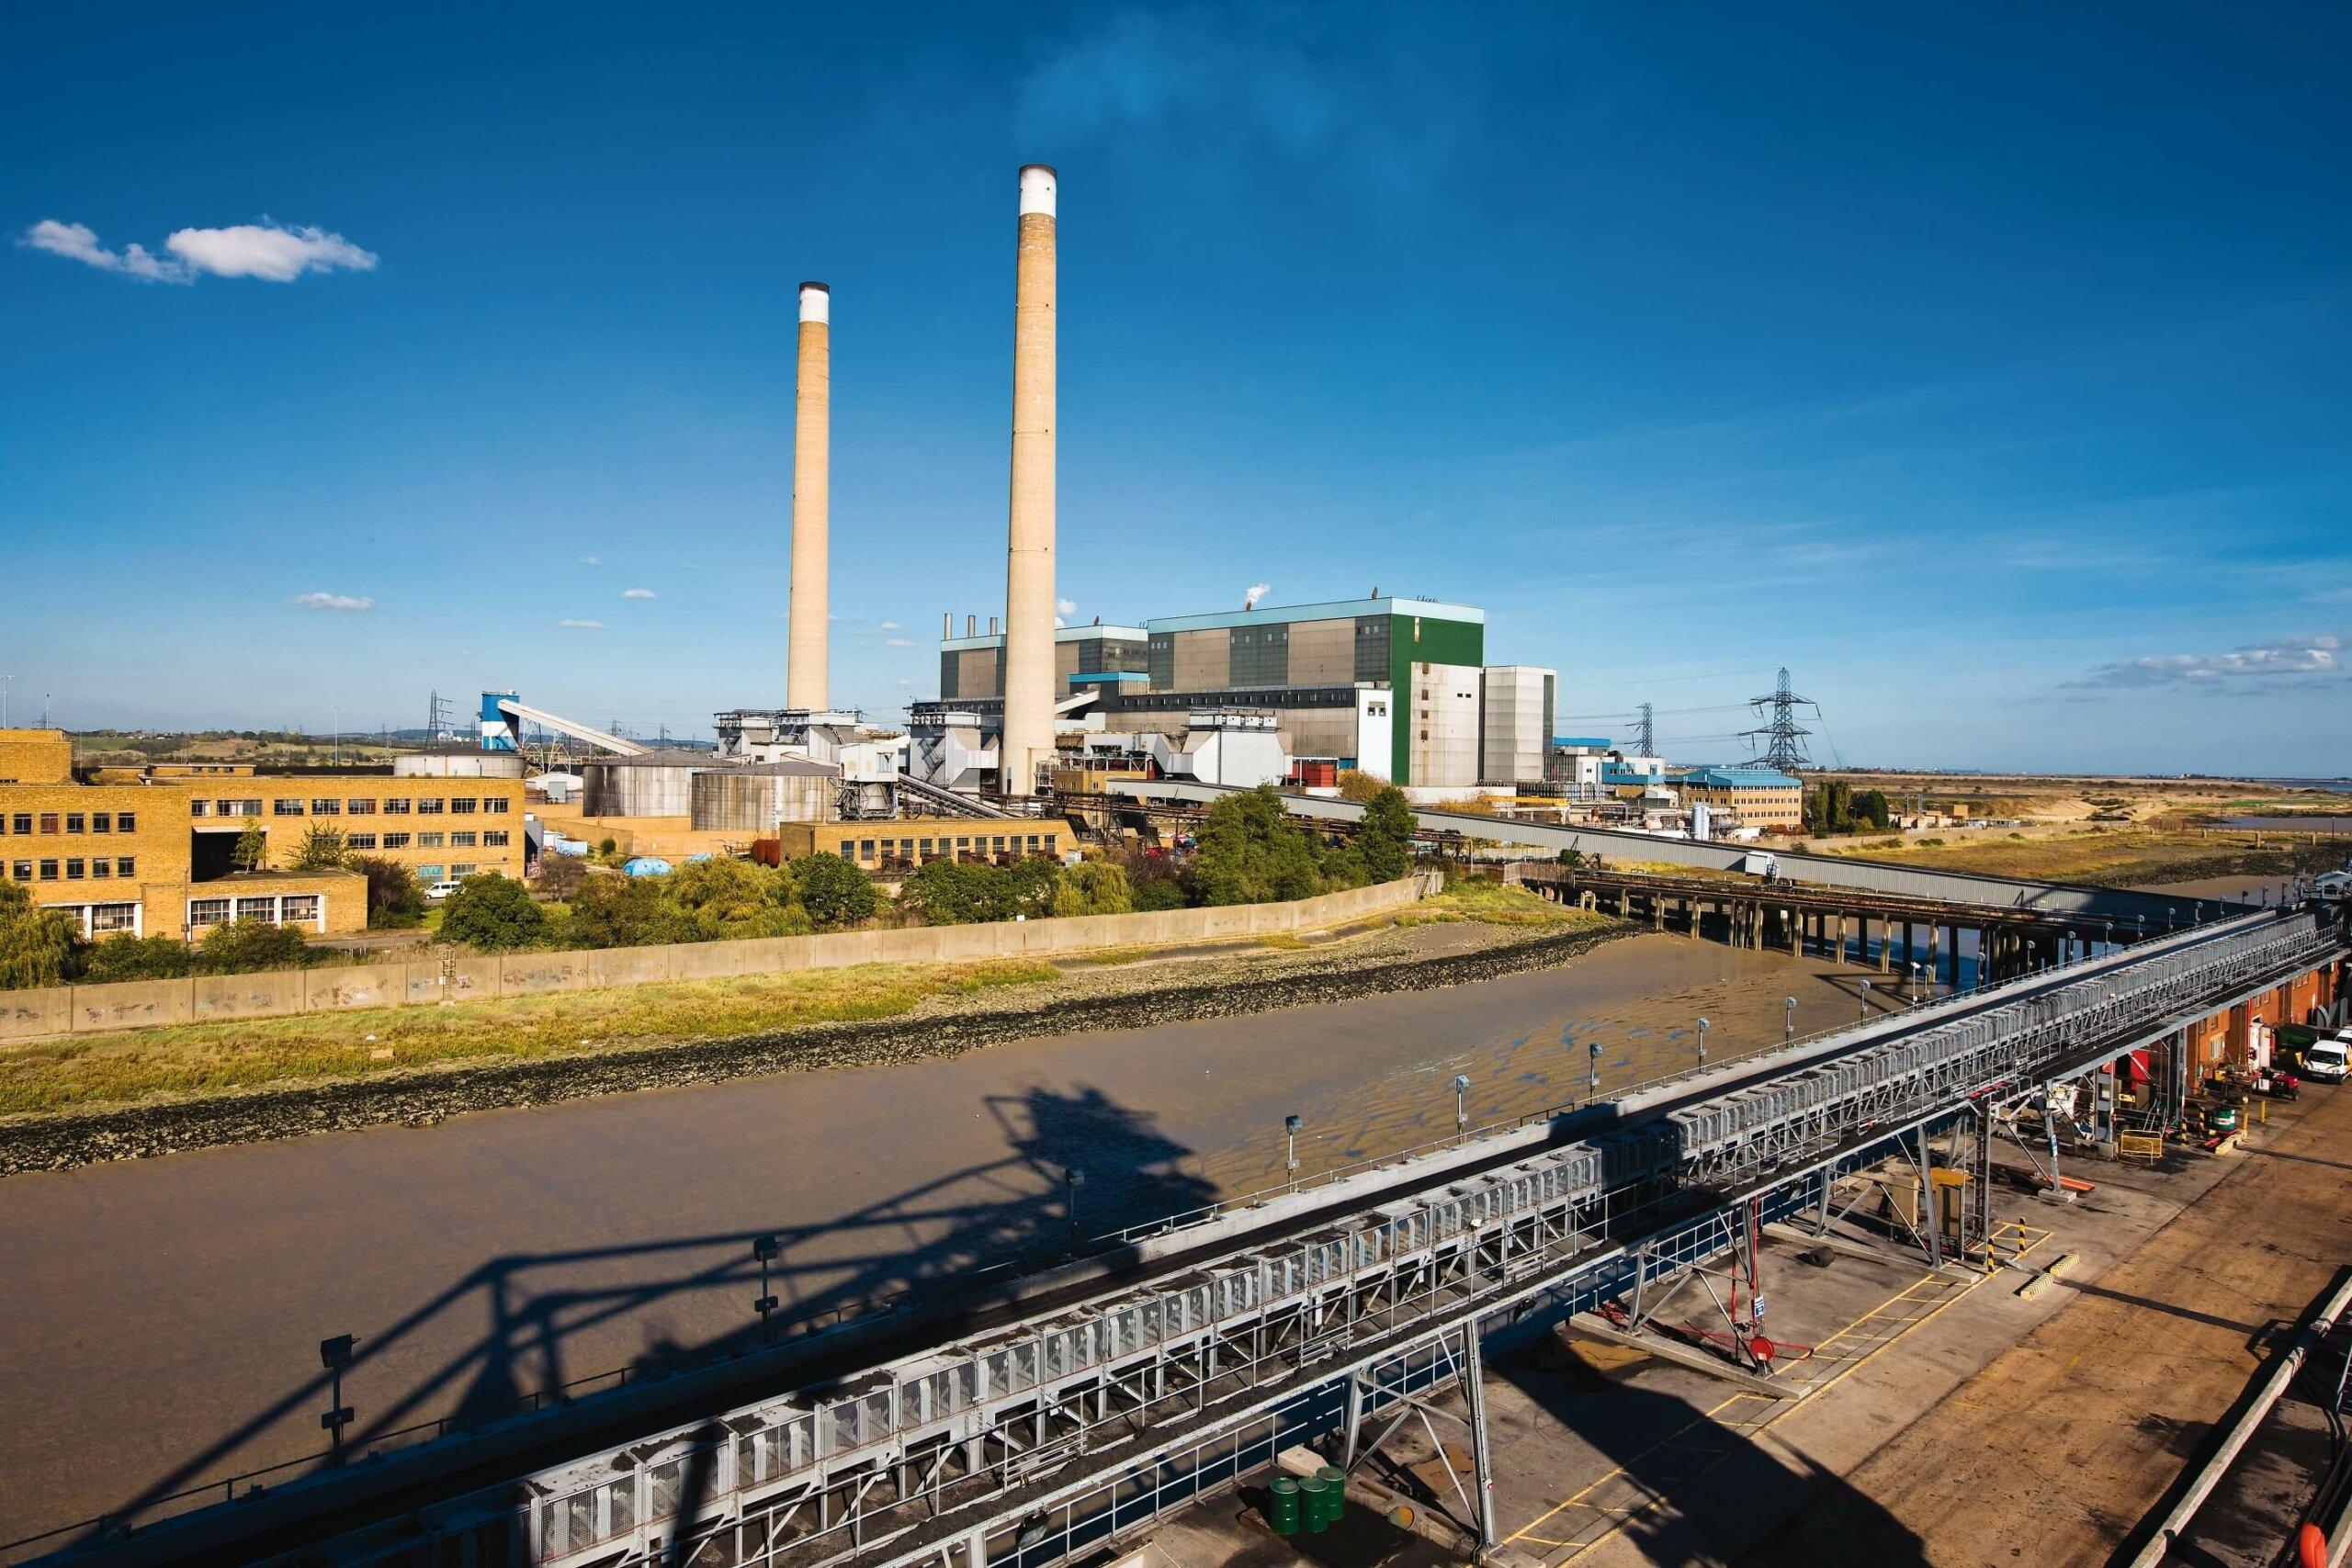 Aufnahme des Tilbury Power Center Kohlekraftwerk vor der Umrüstung